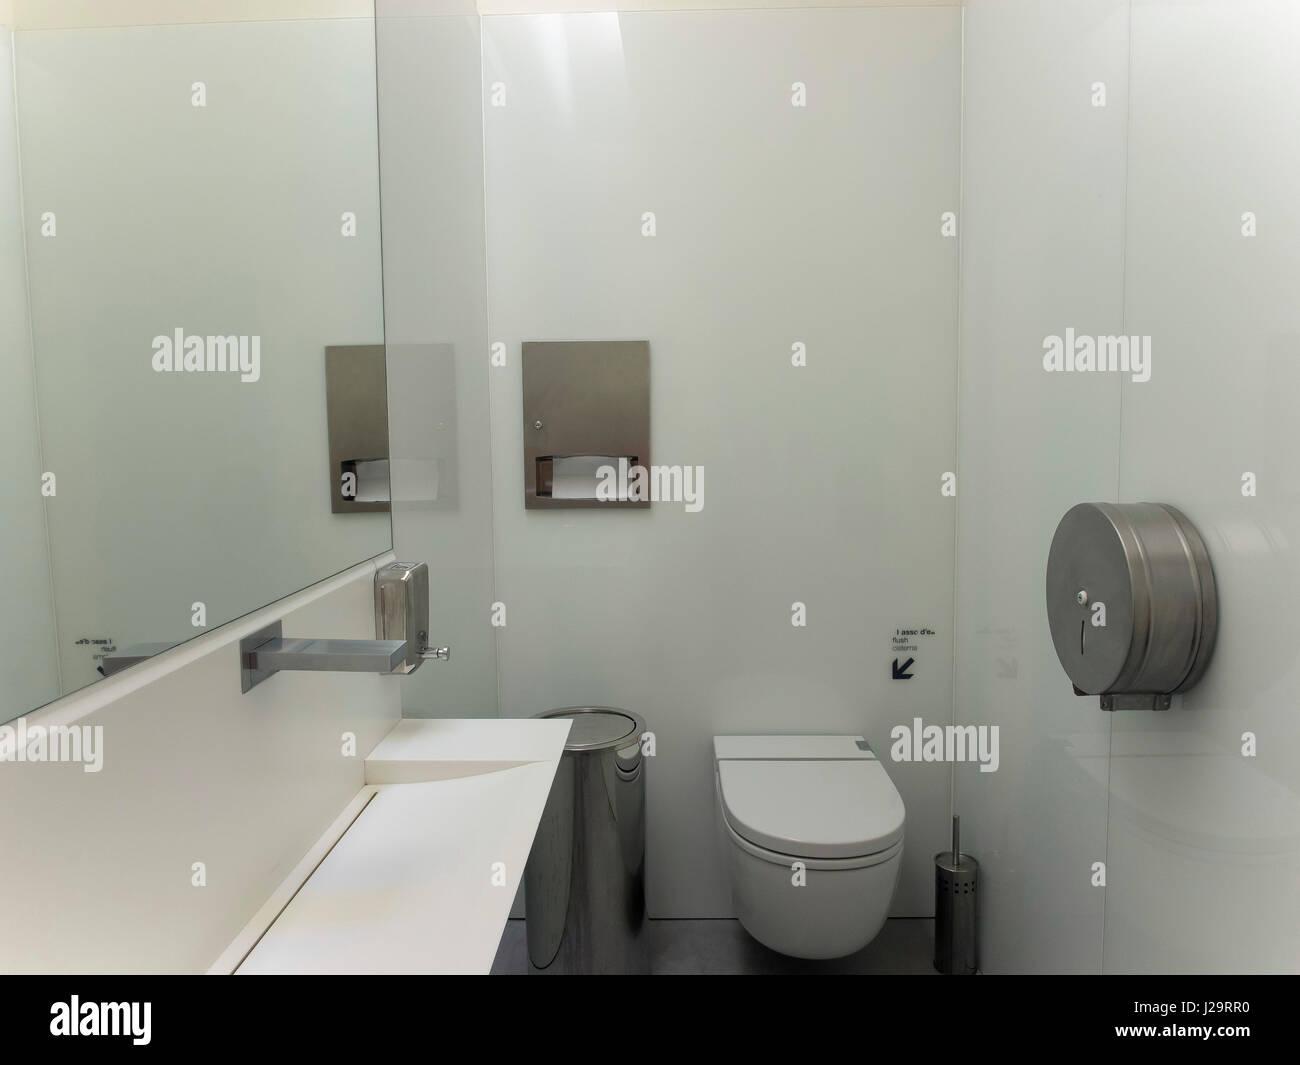 Toilet Of A Modern Restaurant Stock Photo Alamy